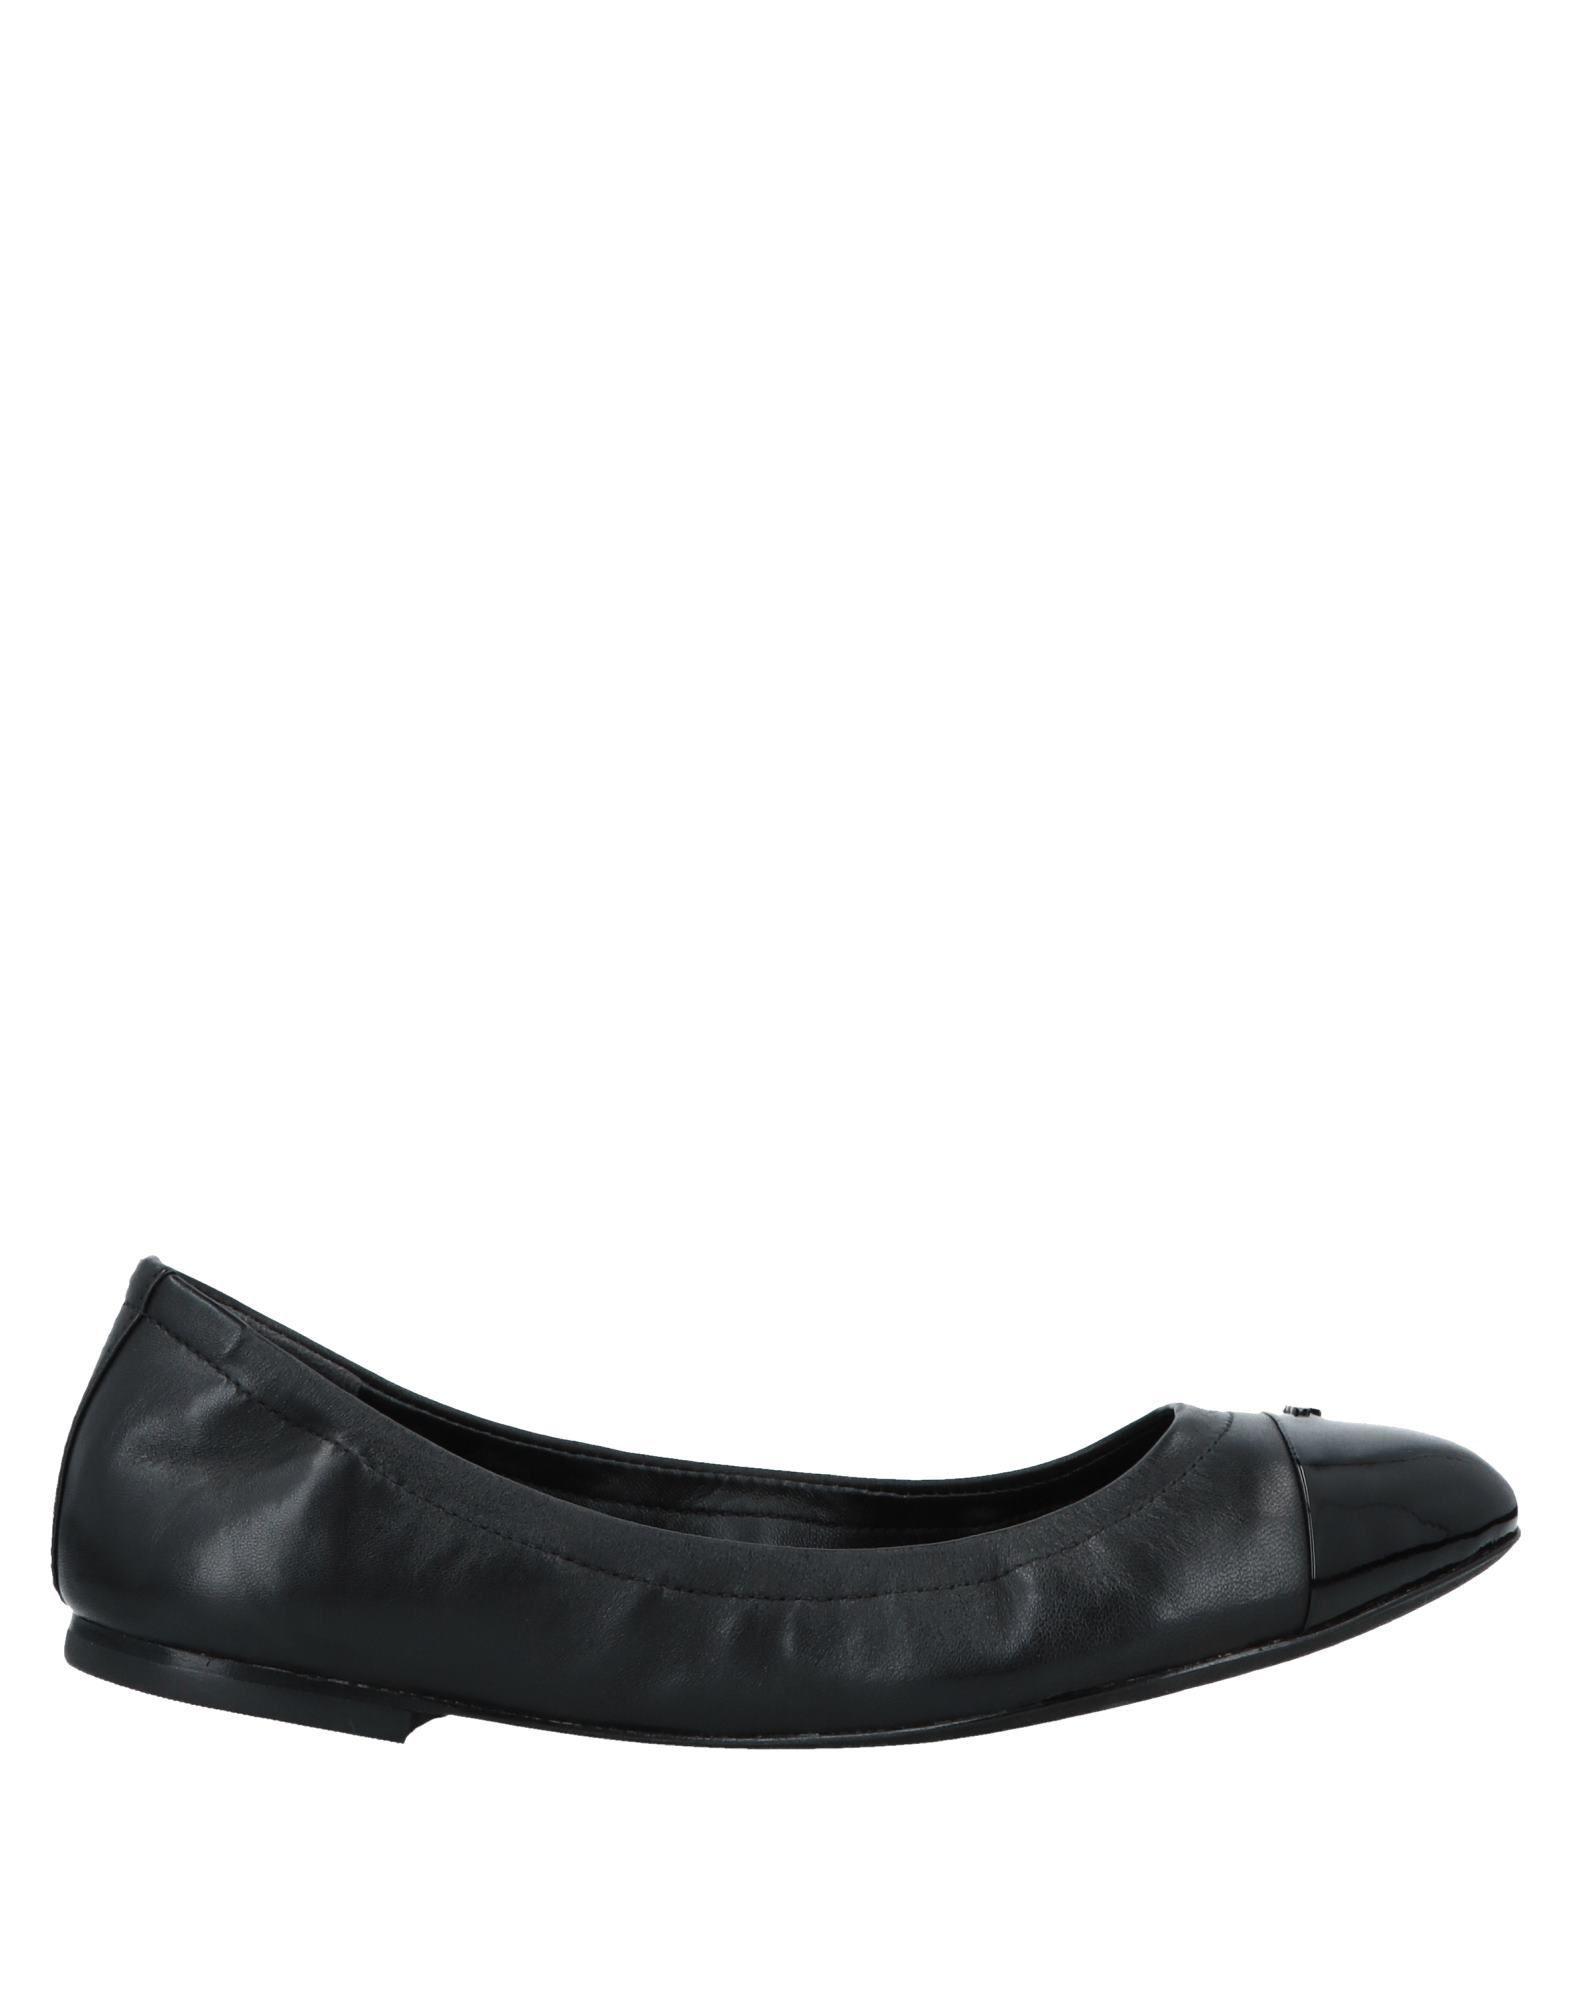 c9bbc958396 Lyst - Tory Burch Ballet Flats in Black